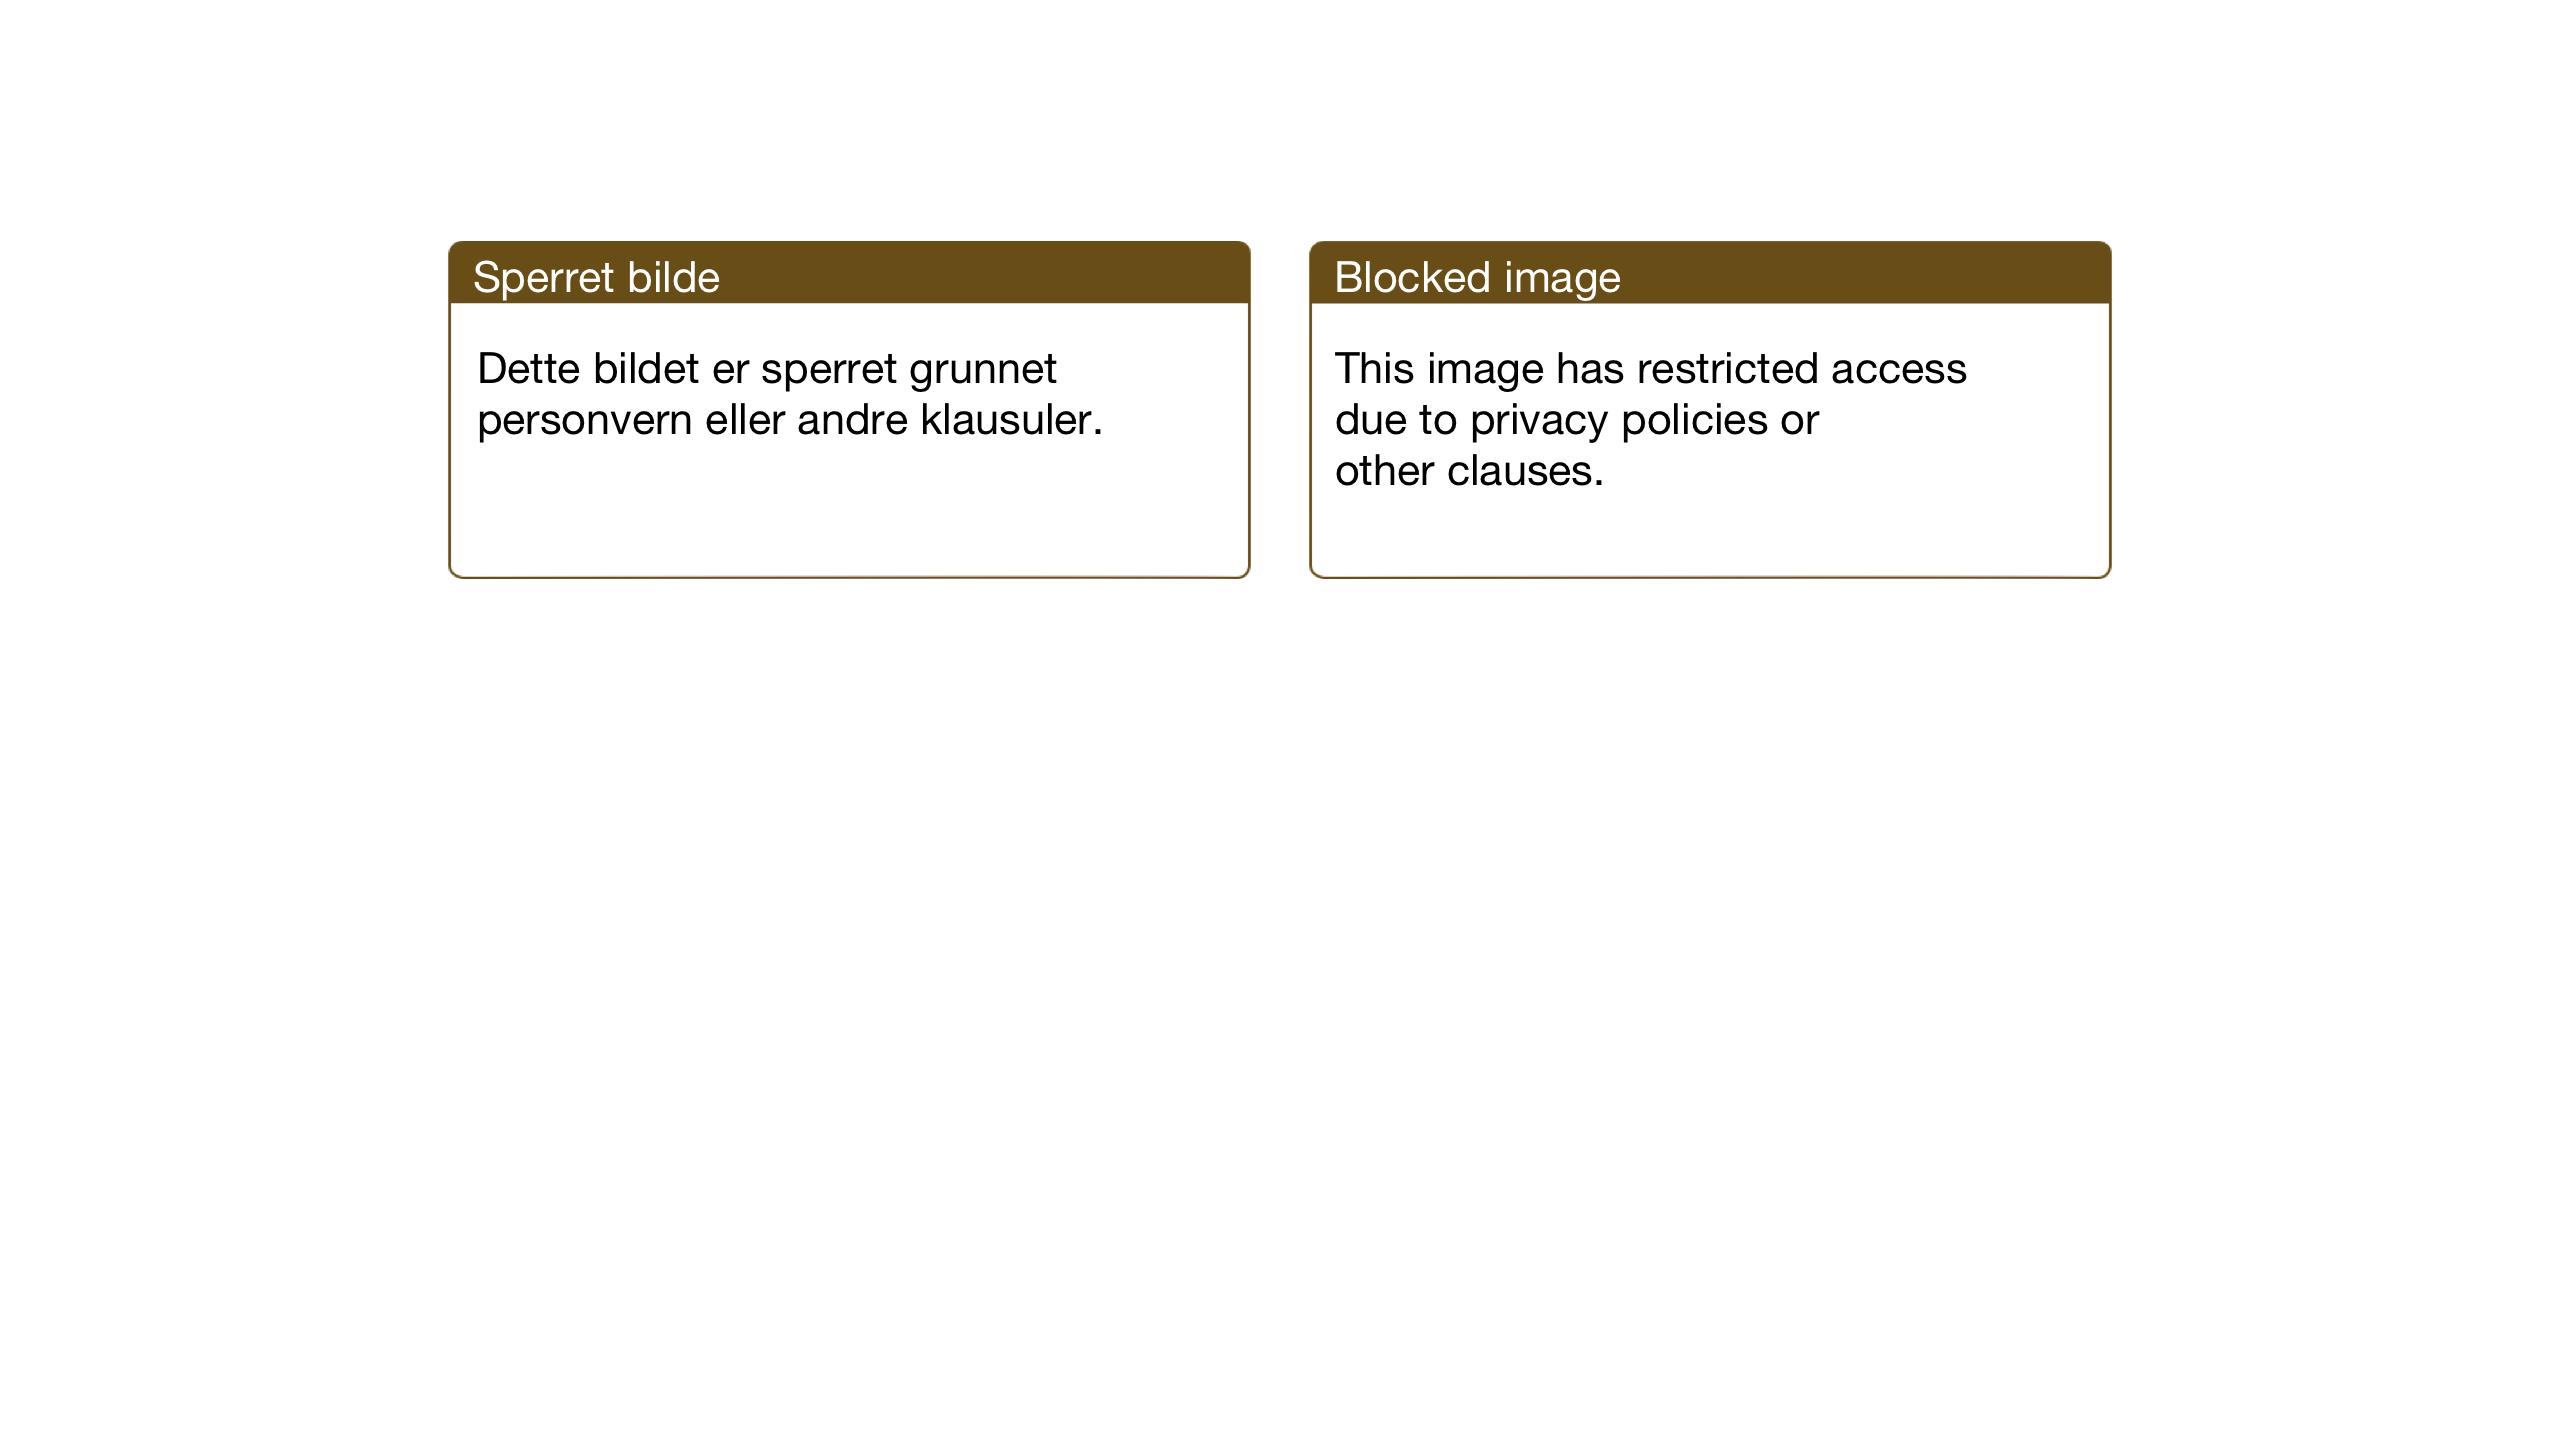 SAT, Grytten sokneprestkontor, Ministerialbok nr. 546A04, 1919-1956, s. 194